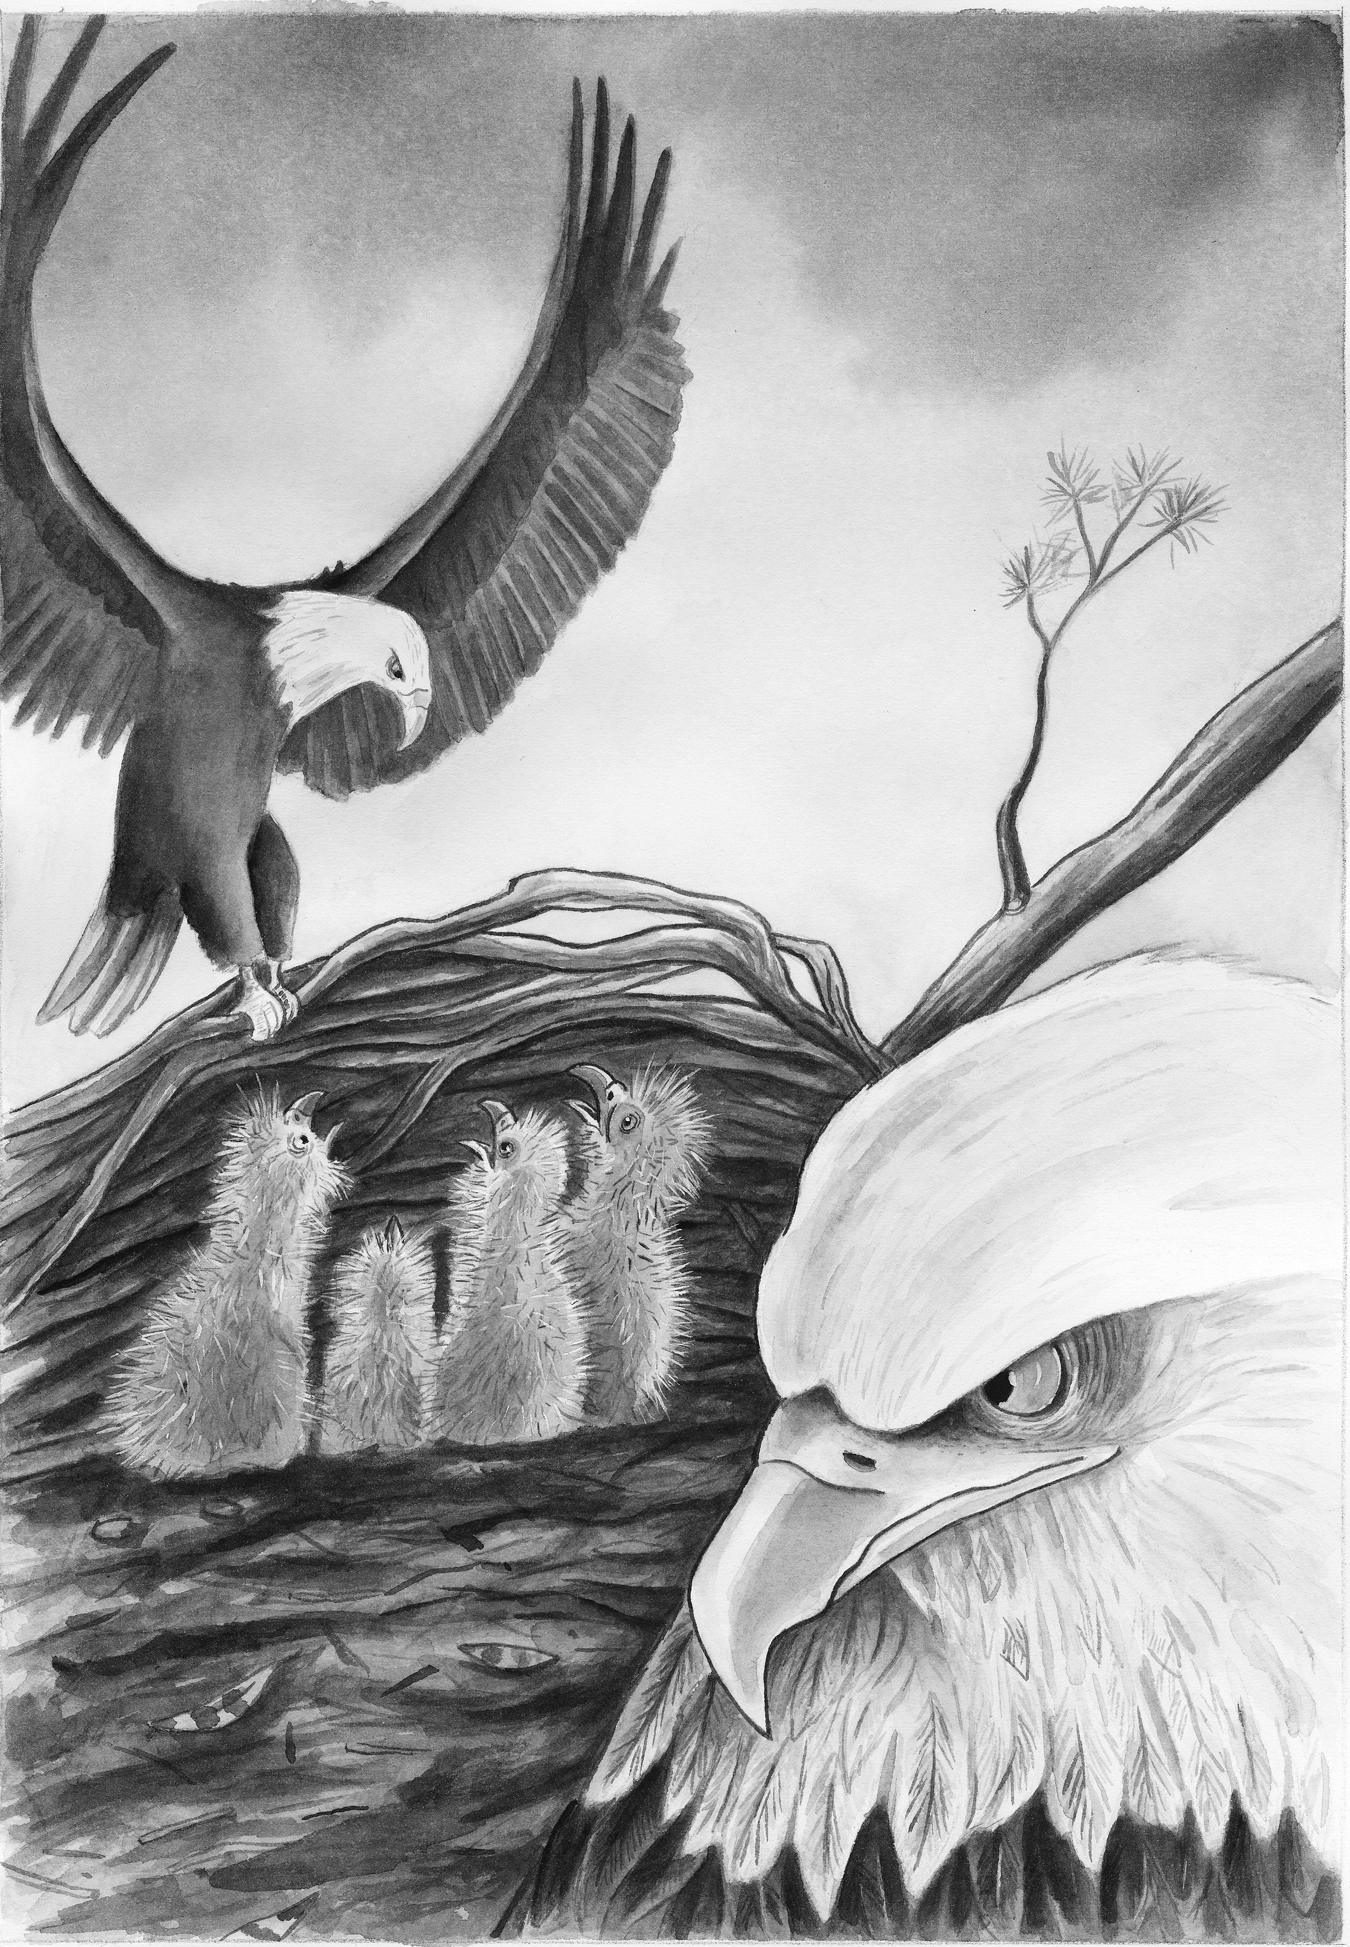 16_Eagles Nest_ed_size copy.jpg